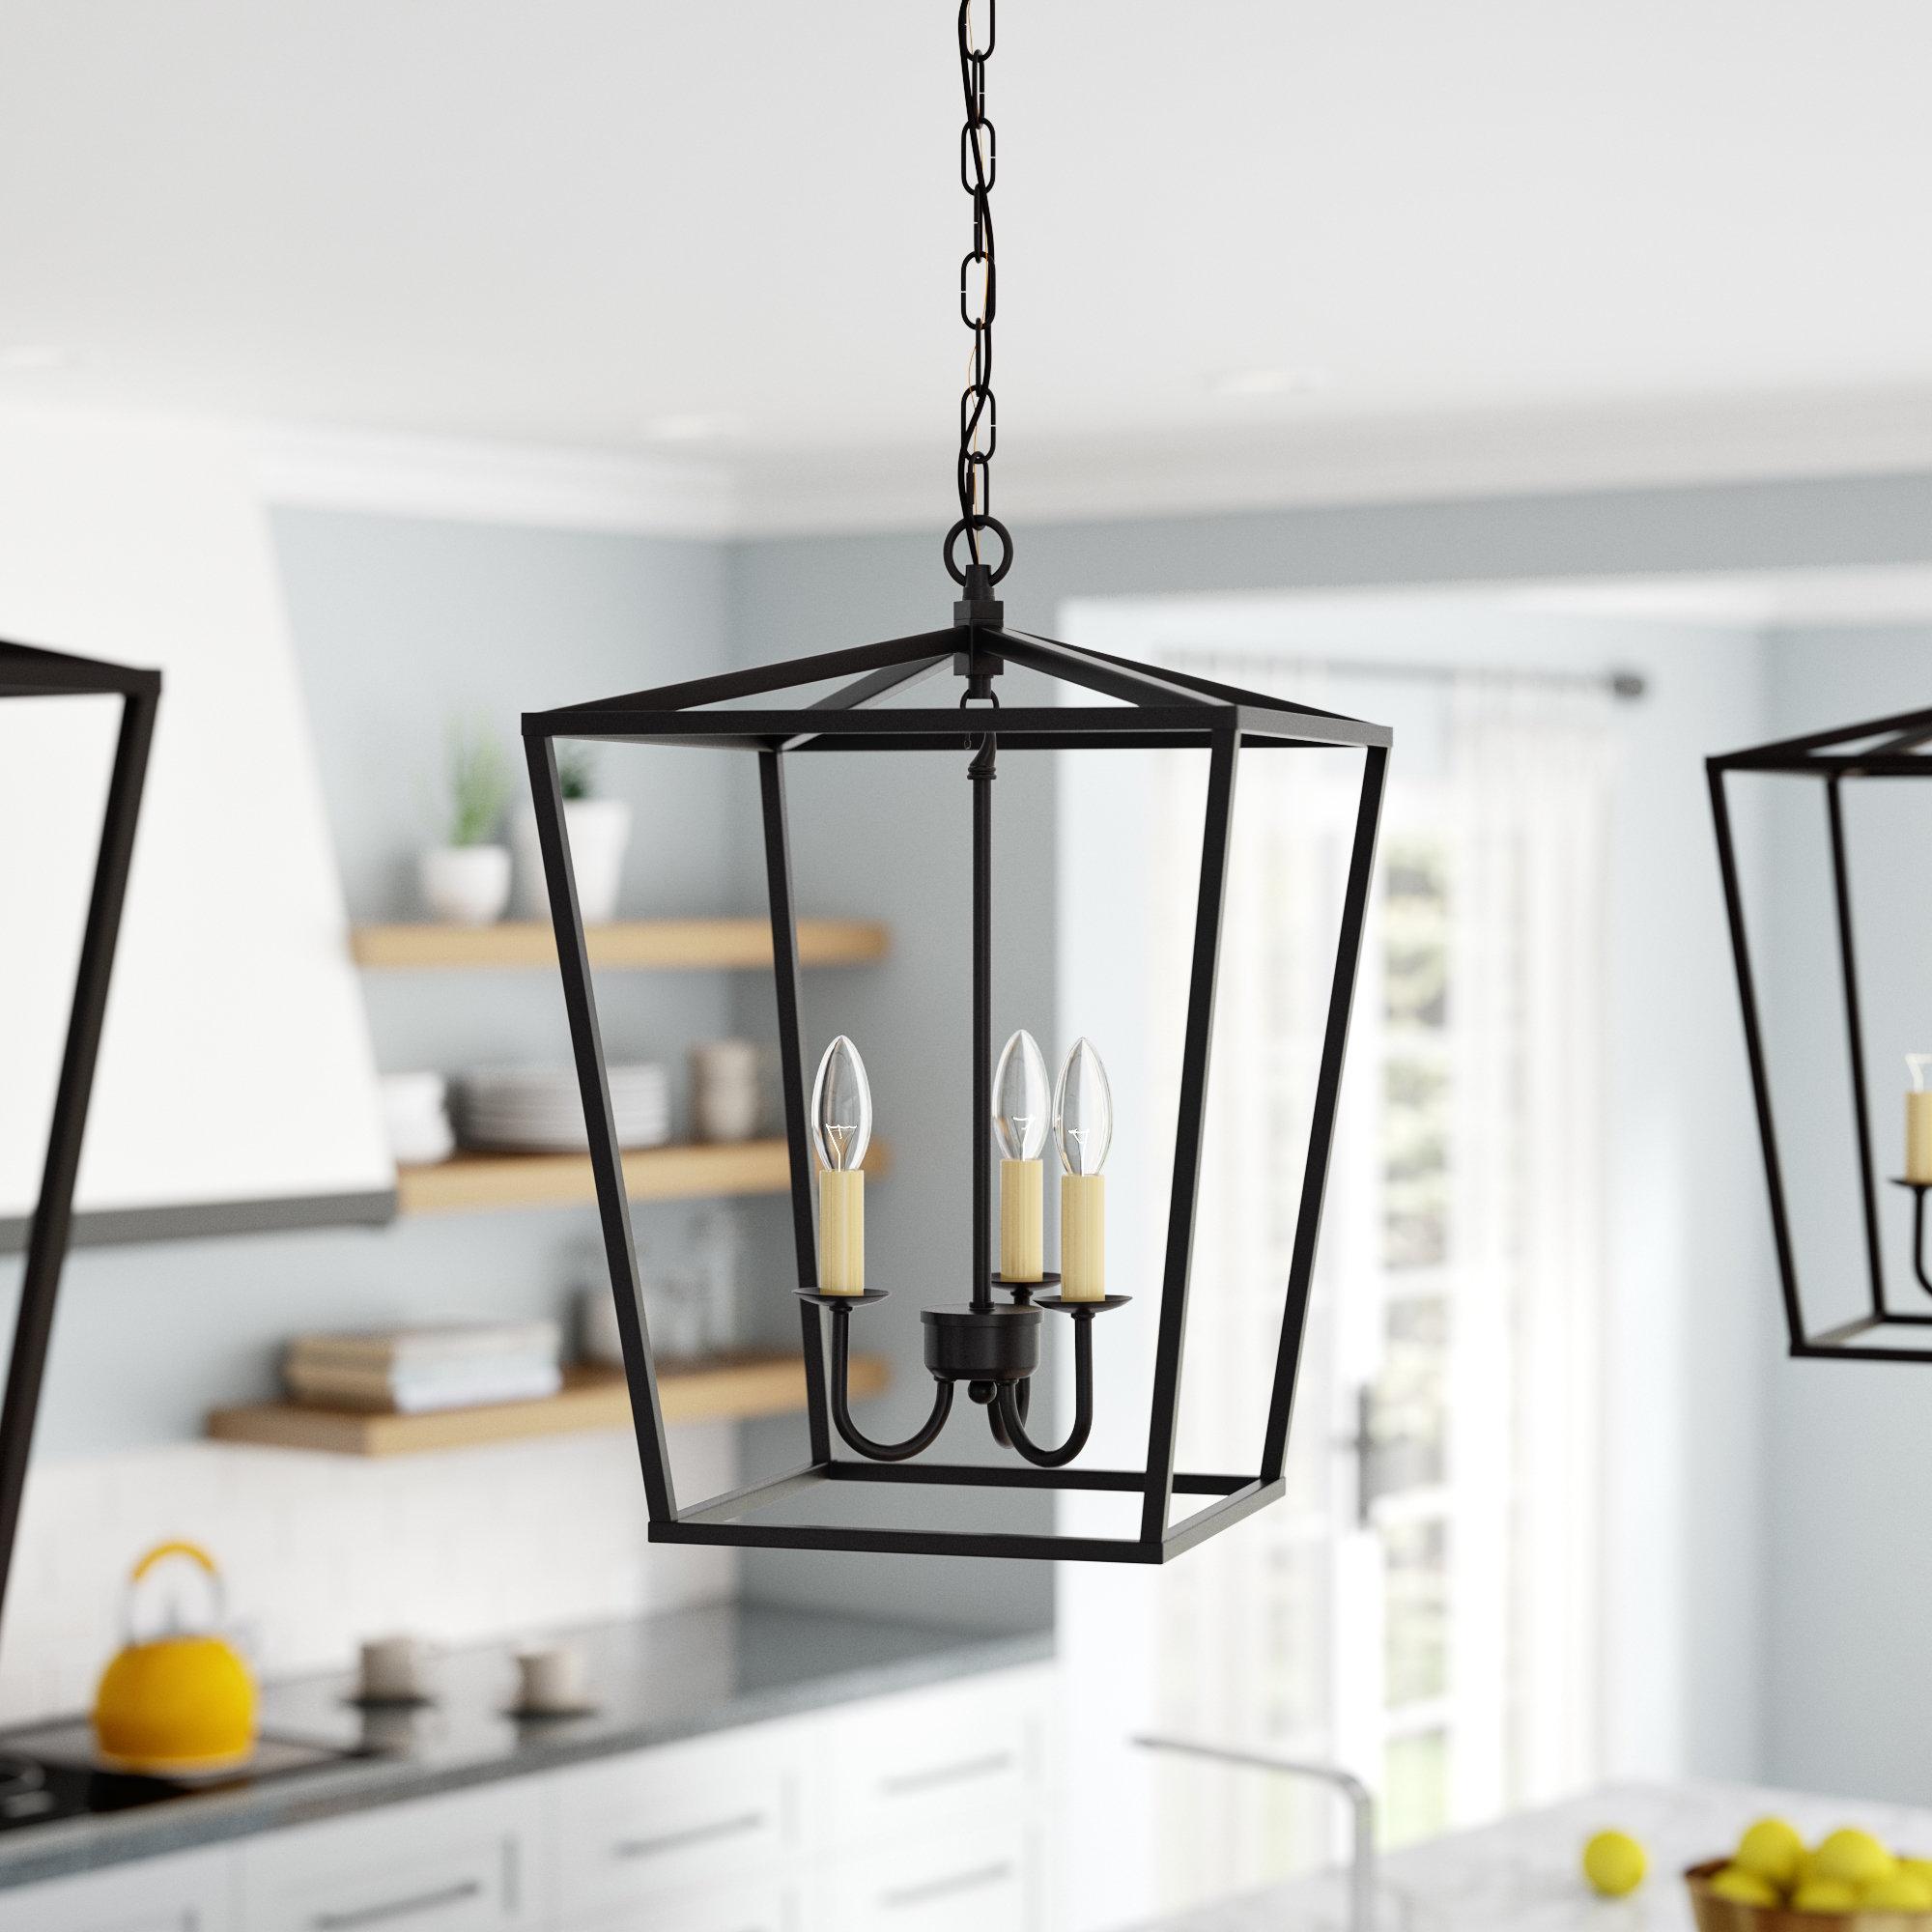 Finnick 3 Light Lantern Pendants Regarding Fashionable Finnick 3 Light Lantern Pendant (Gallery 1 of 20)